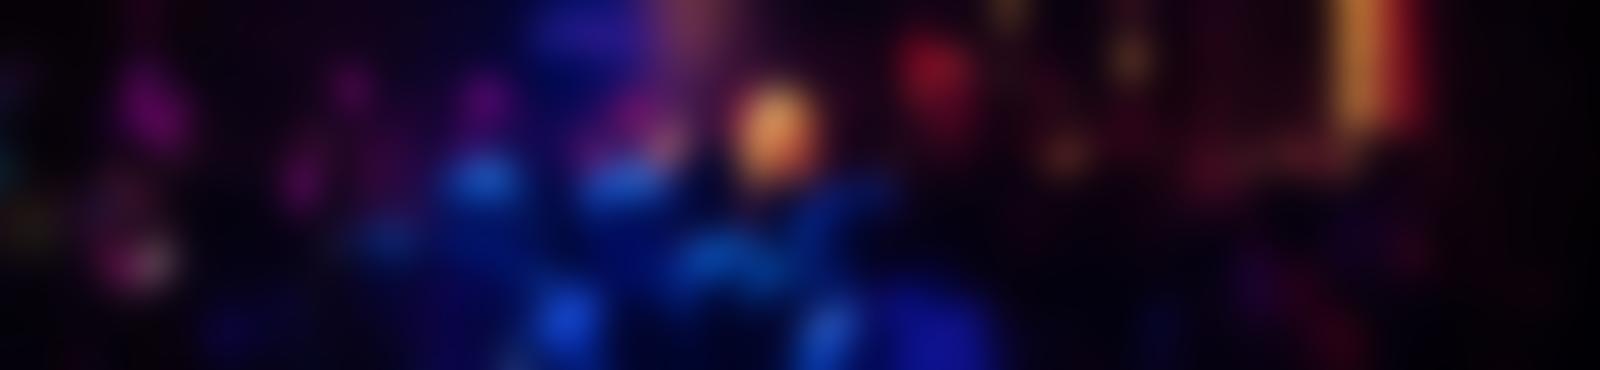 Blurred 851637d9 3174 4bc5 8493 5112bbccbab2